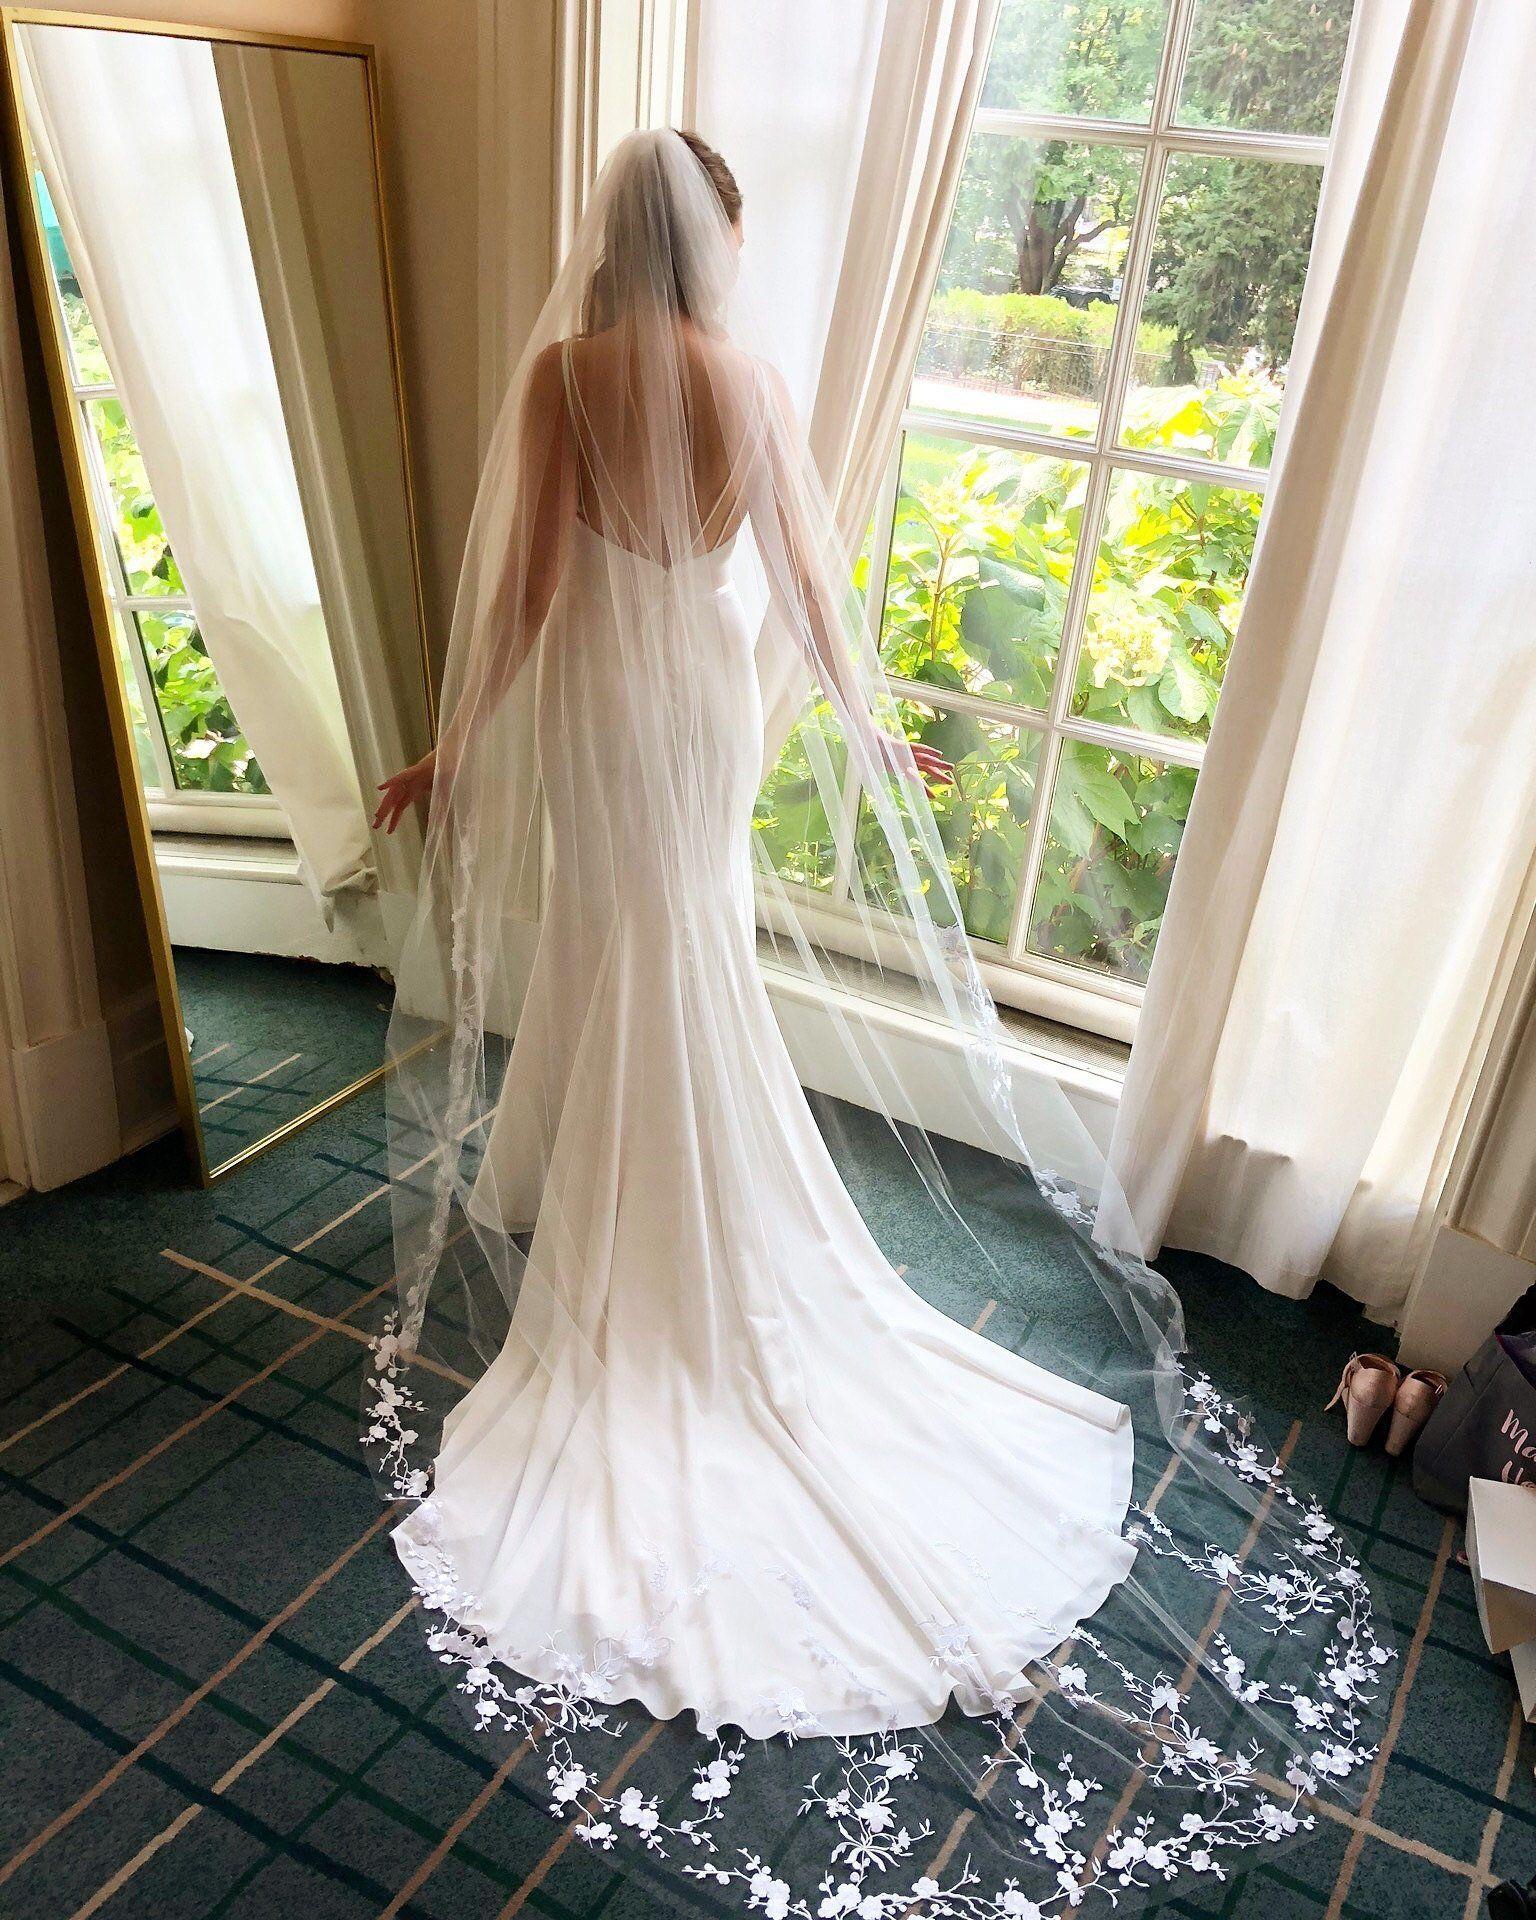 Floral Wedding Veil Plum Blossom Flower Veil White Veil Etsy Floral Wedding Veils Wedding Dresses Chapel Length Wedding Veil [ 1920 x 1536 Pixel ]